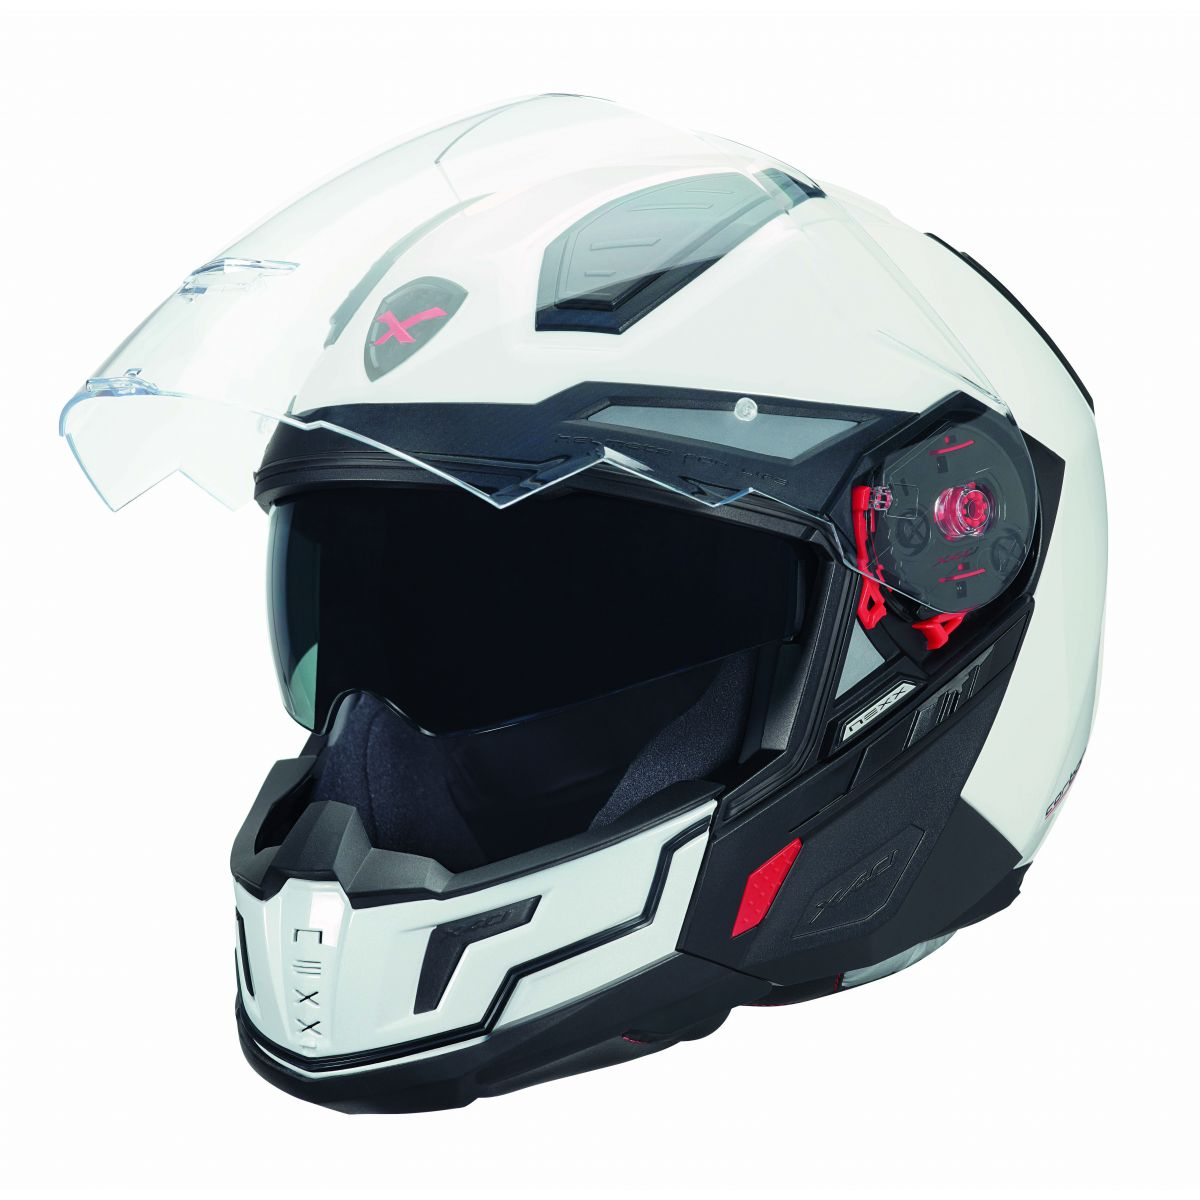 Capacete Nexx X40 Maxijet Plain Branco Promoção!  - Super Bike - Loja Oficial Alpinestars